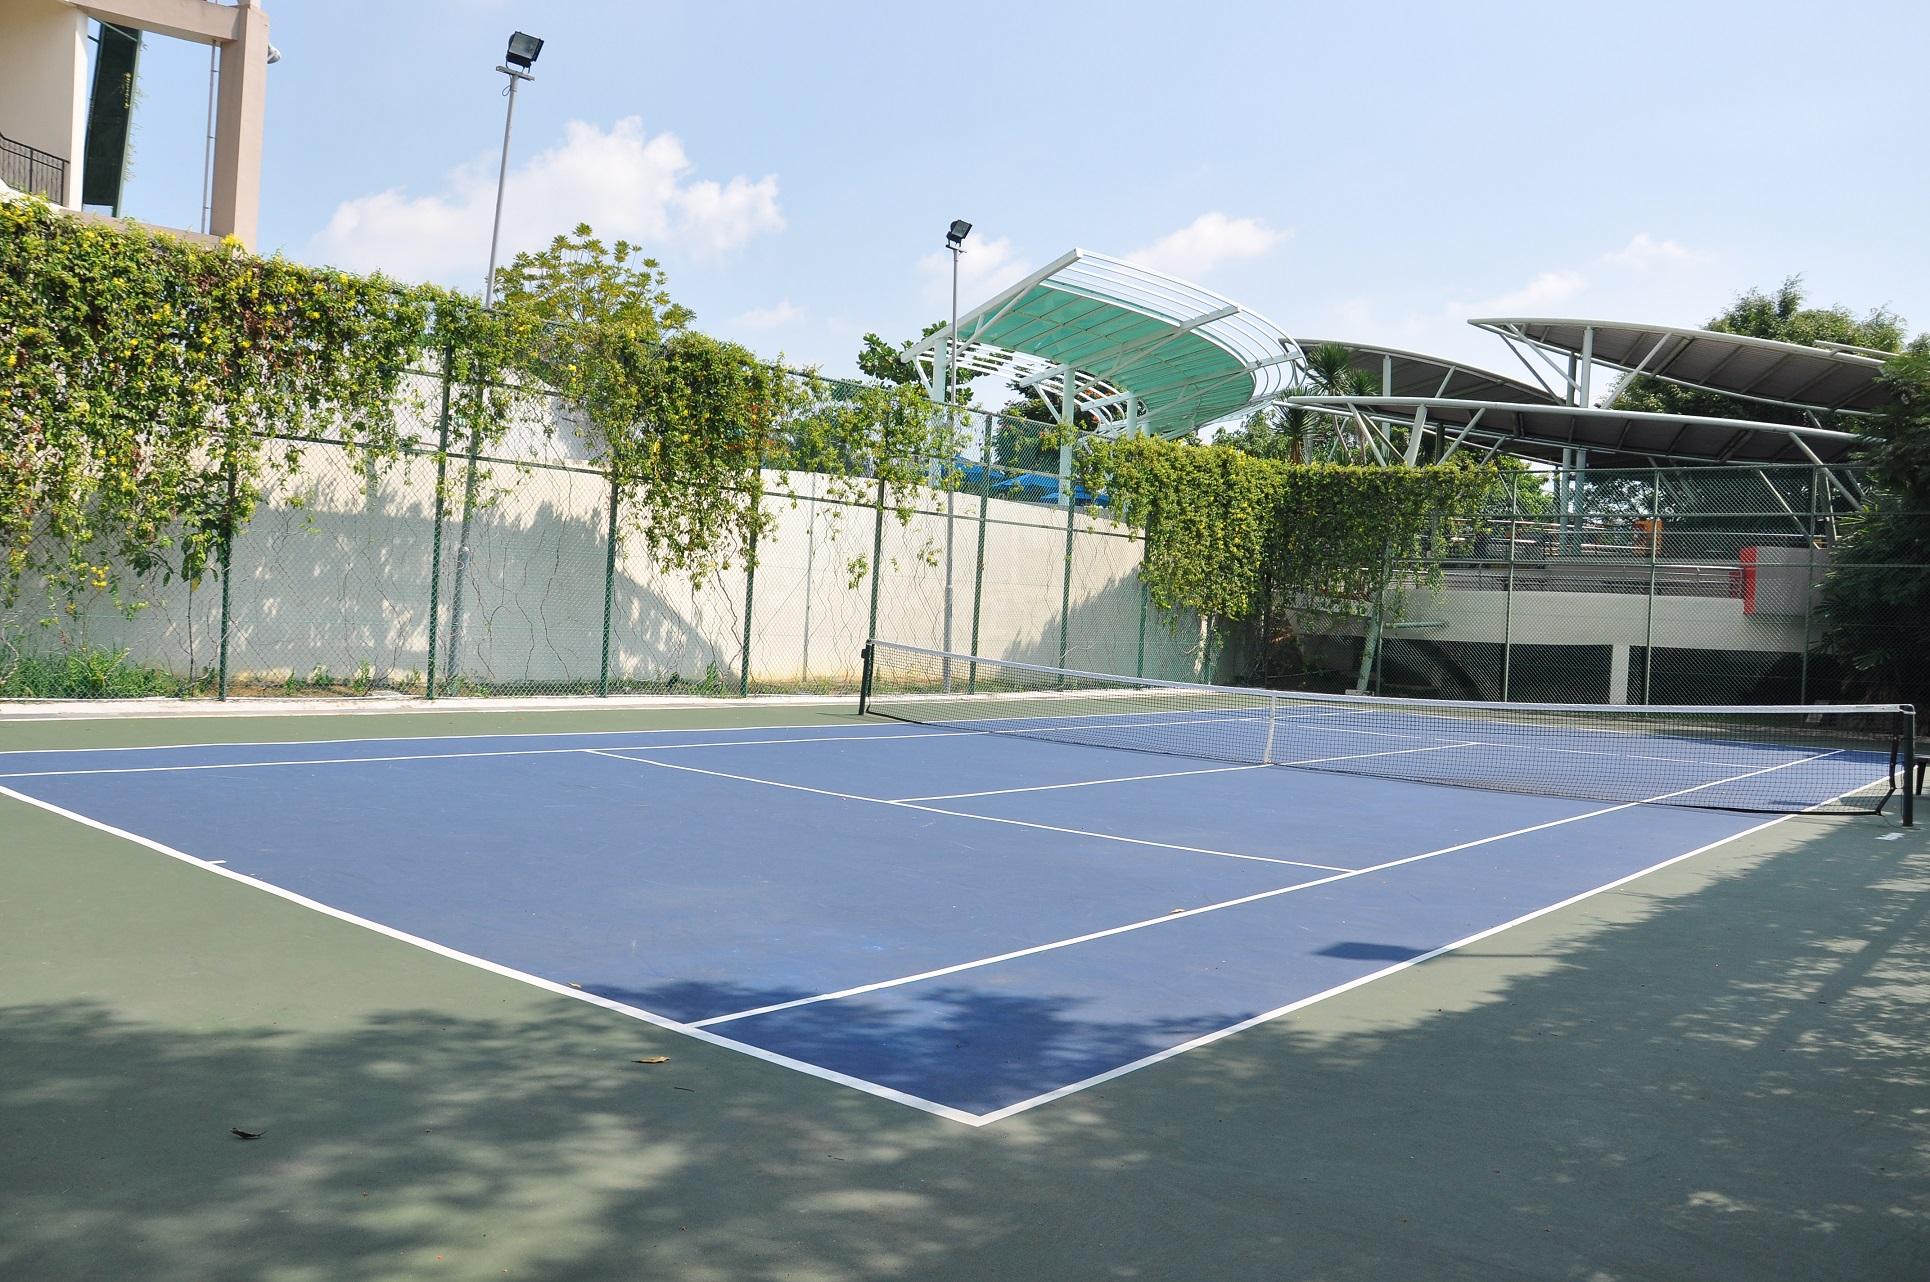 Tennis 1s